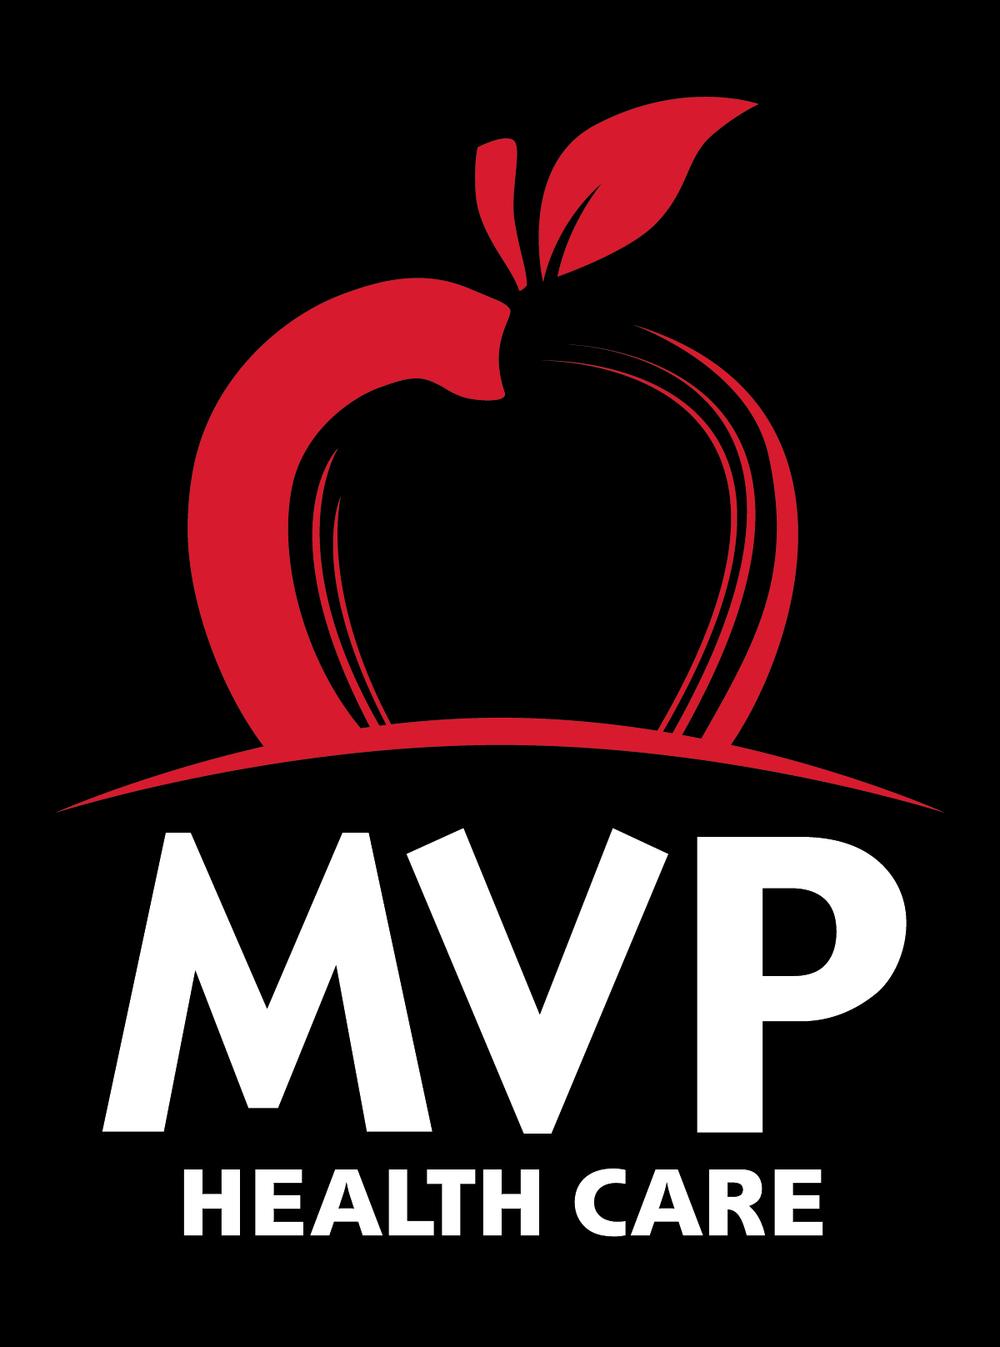 MVP_color.jpg